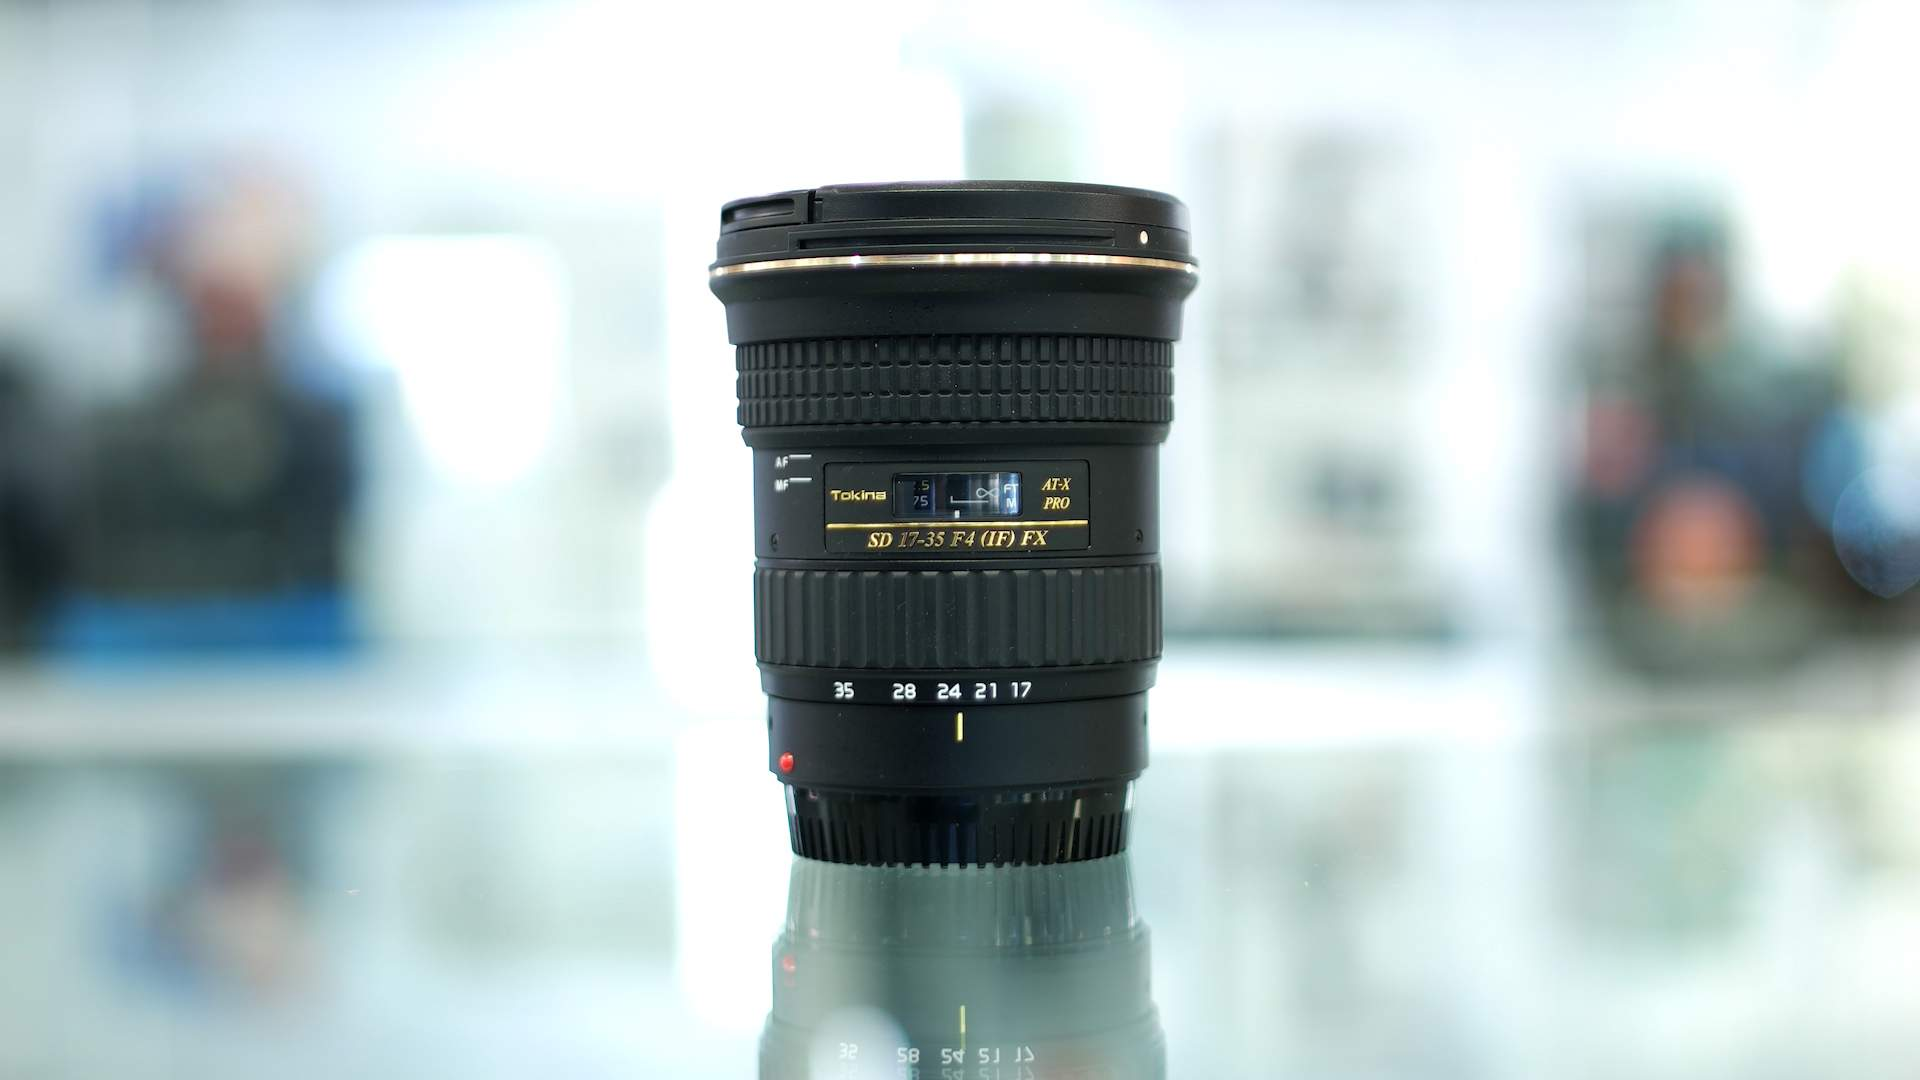 Vista generale obiettivo Tokina 17-35mm f4 Pro FX